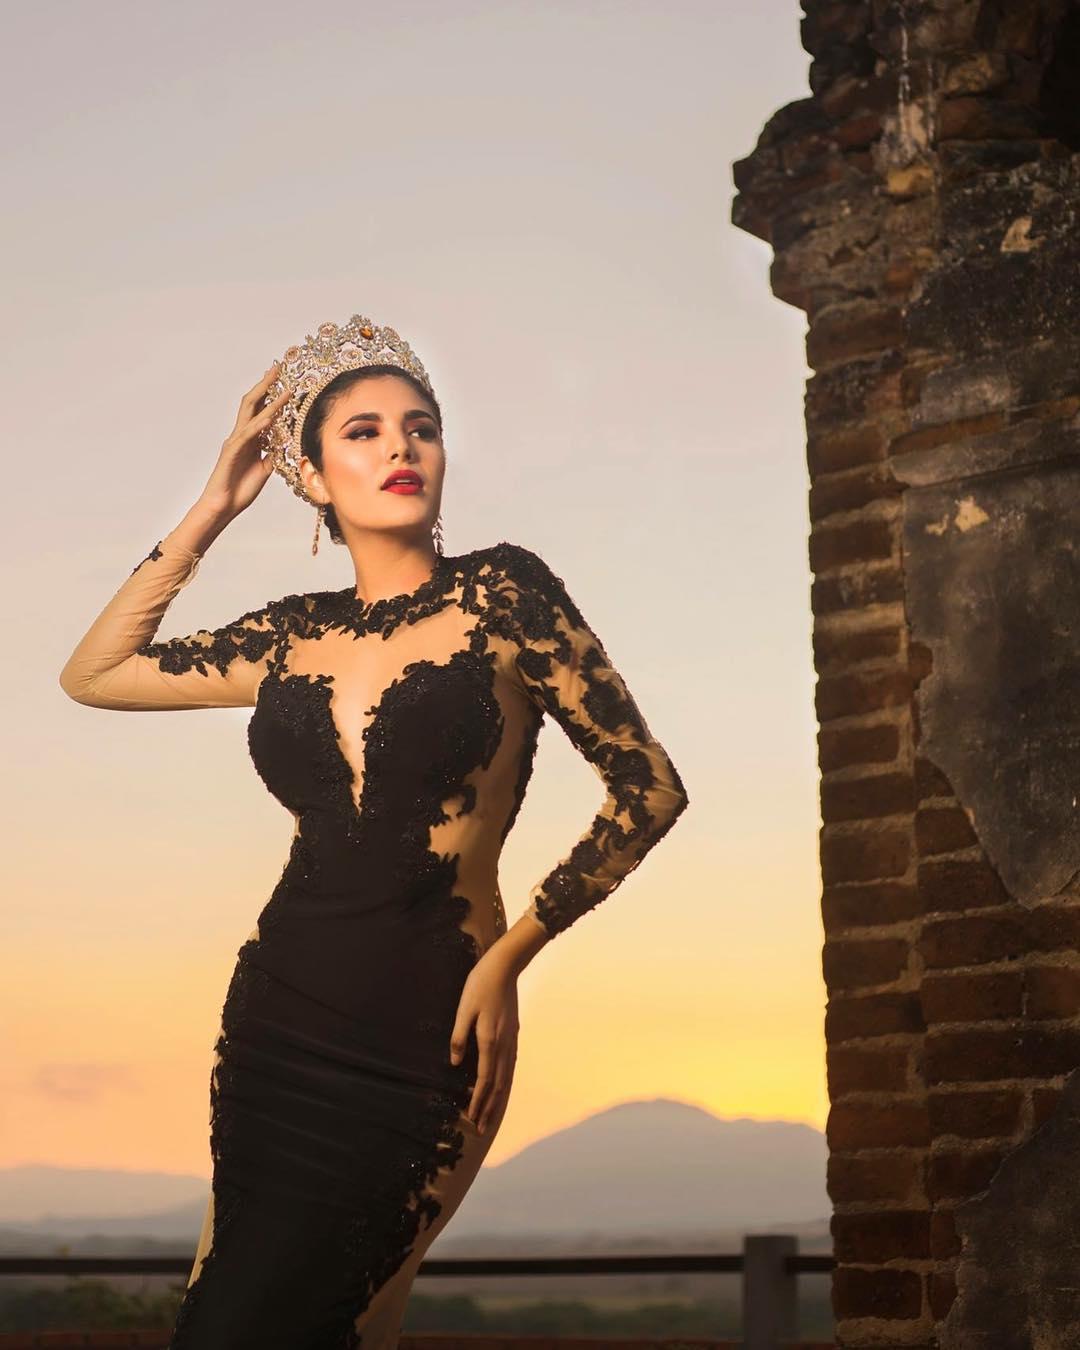 phegda bustillos, miss mexico para reinado inernacional cafe 2018. Zvpdlhmm